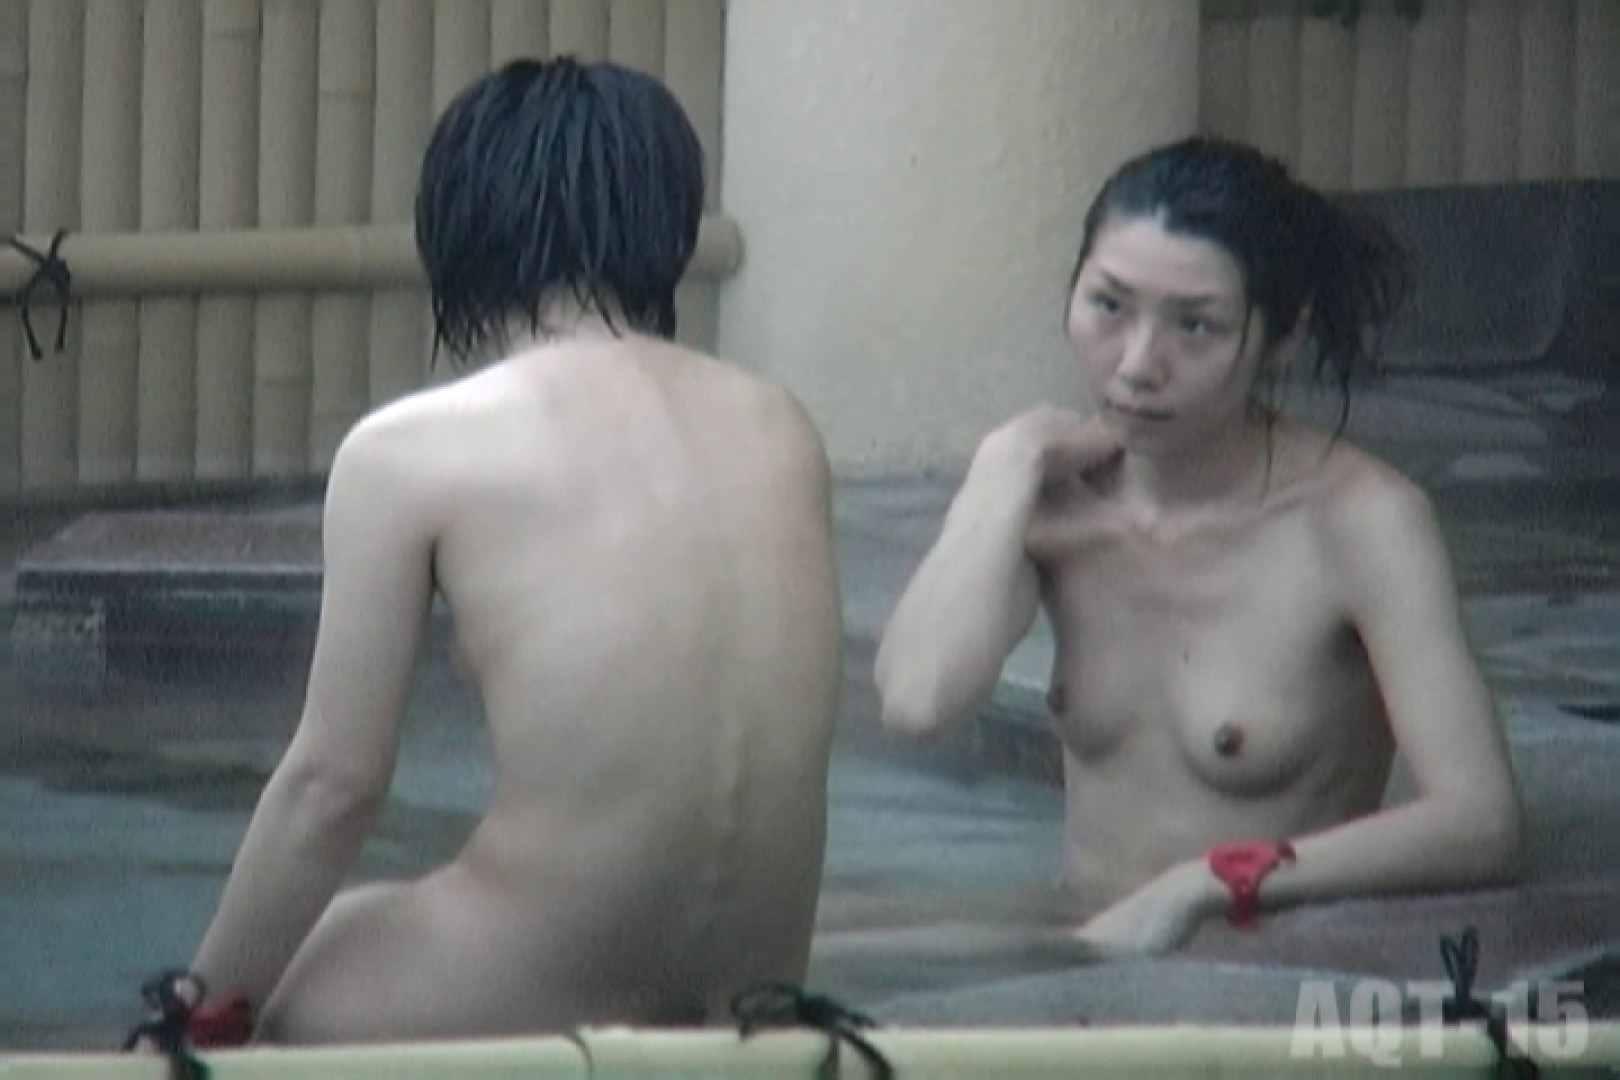 Aquaな露天風呂Vol.837 盗撮映像  107Pix 98